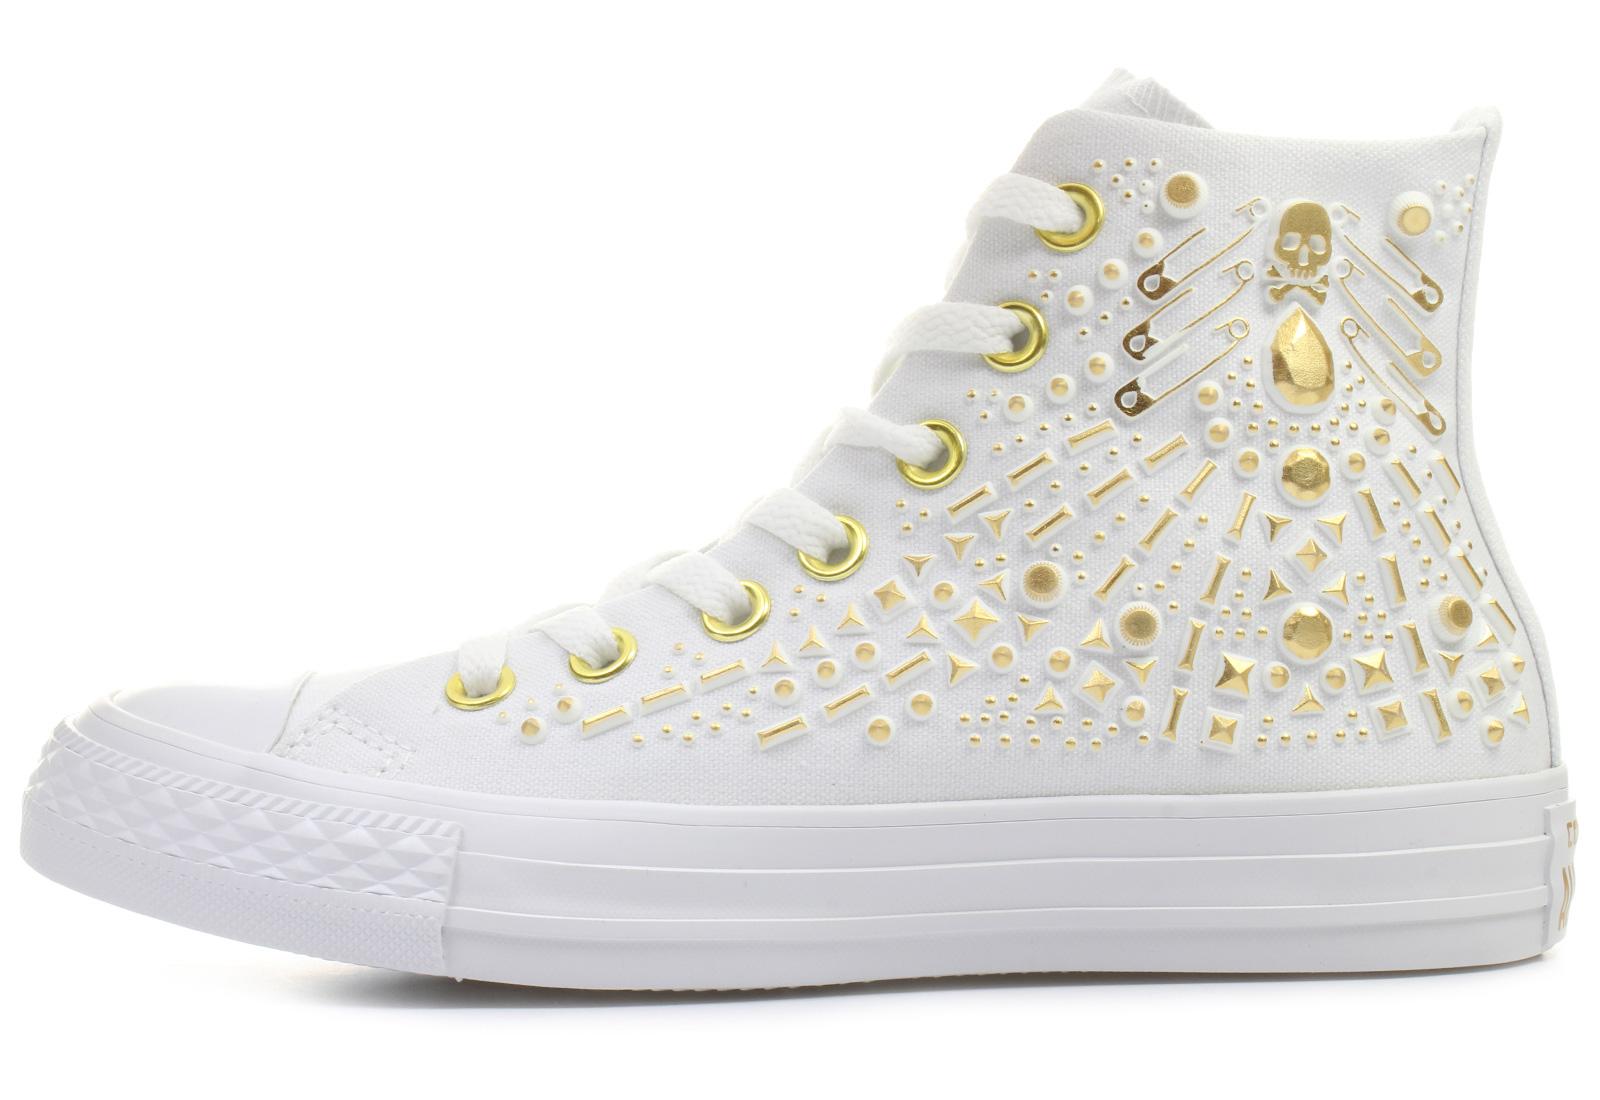 b13309002dbd Converse Sneakers - Chuck Taylor All Star Emboss Hi - 542443C ...